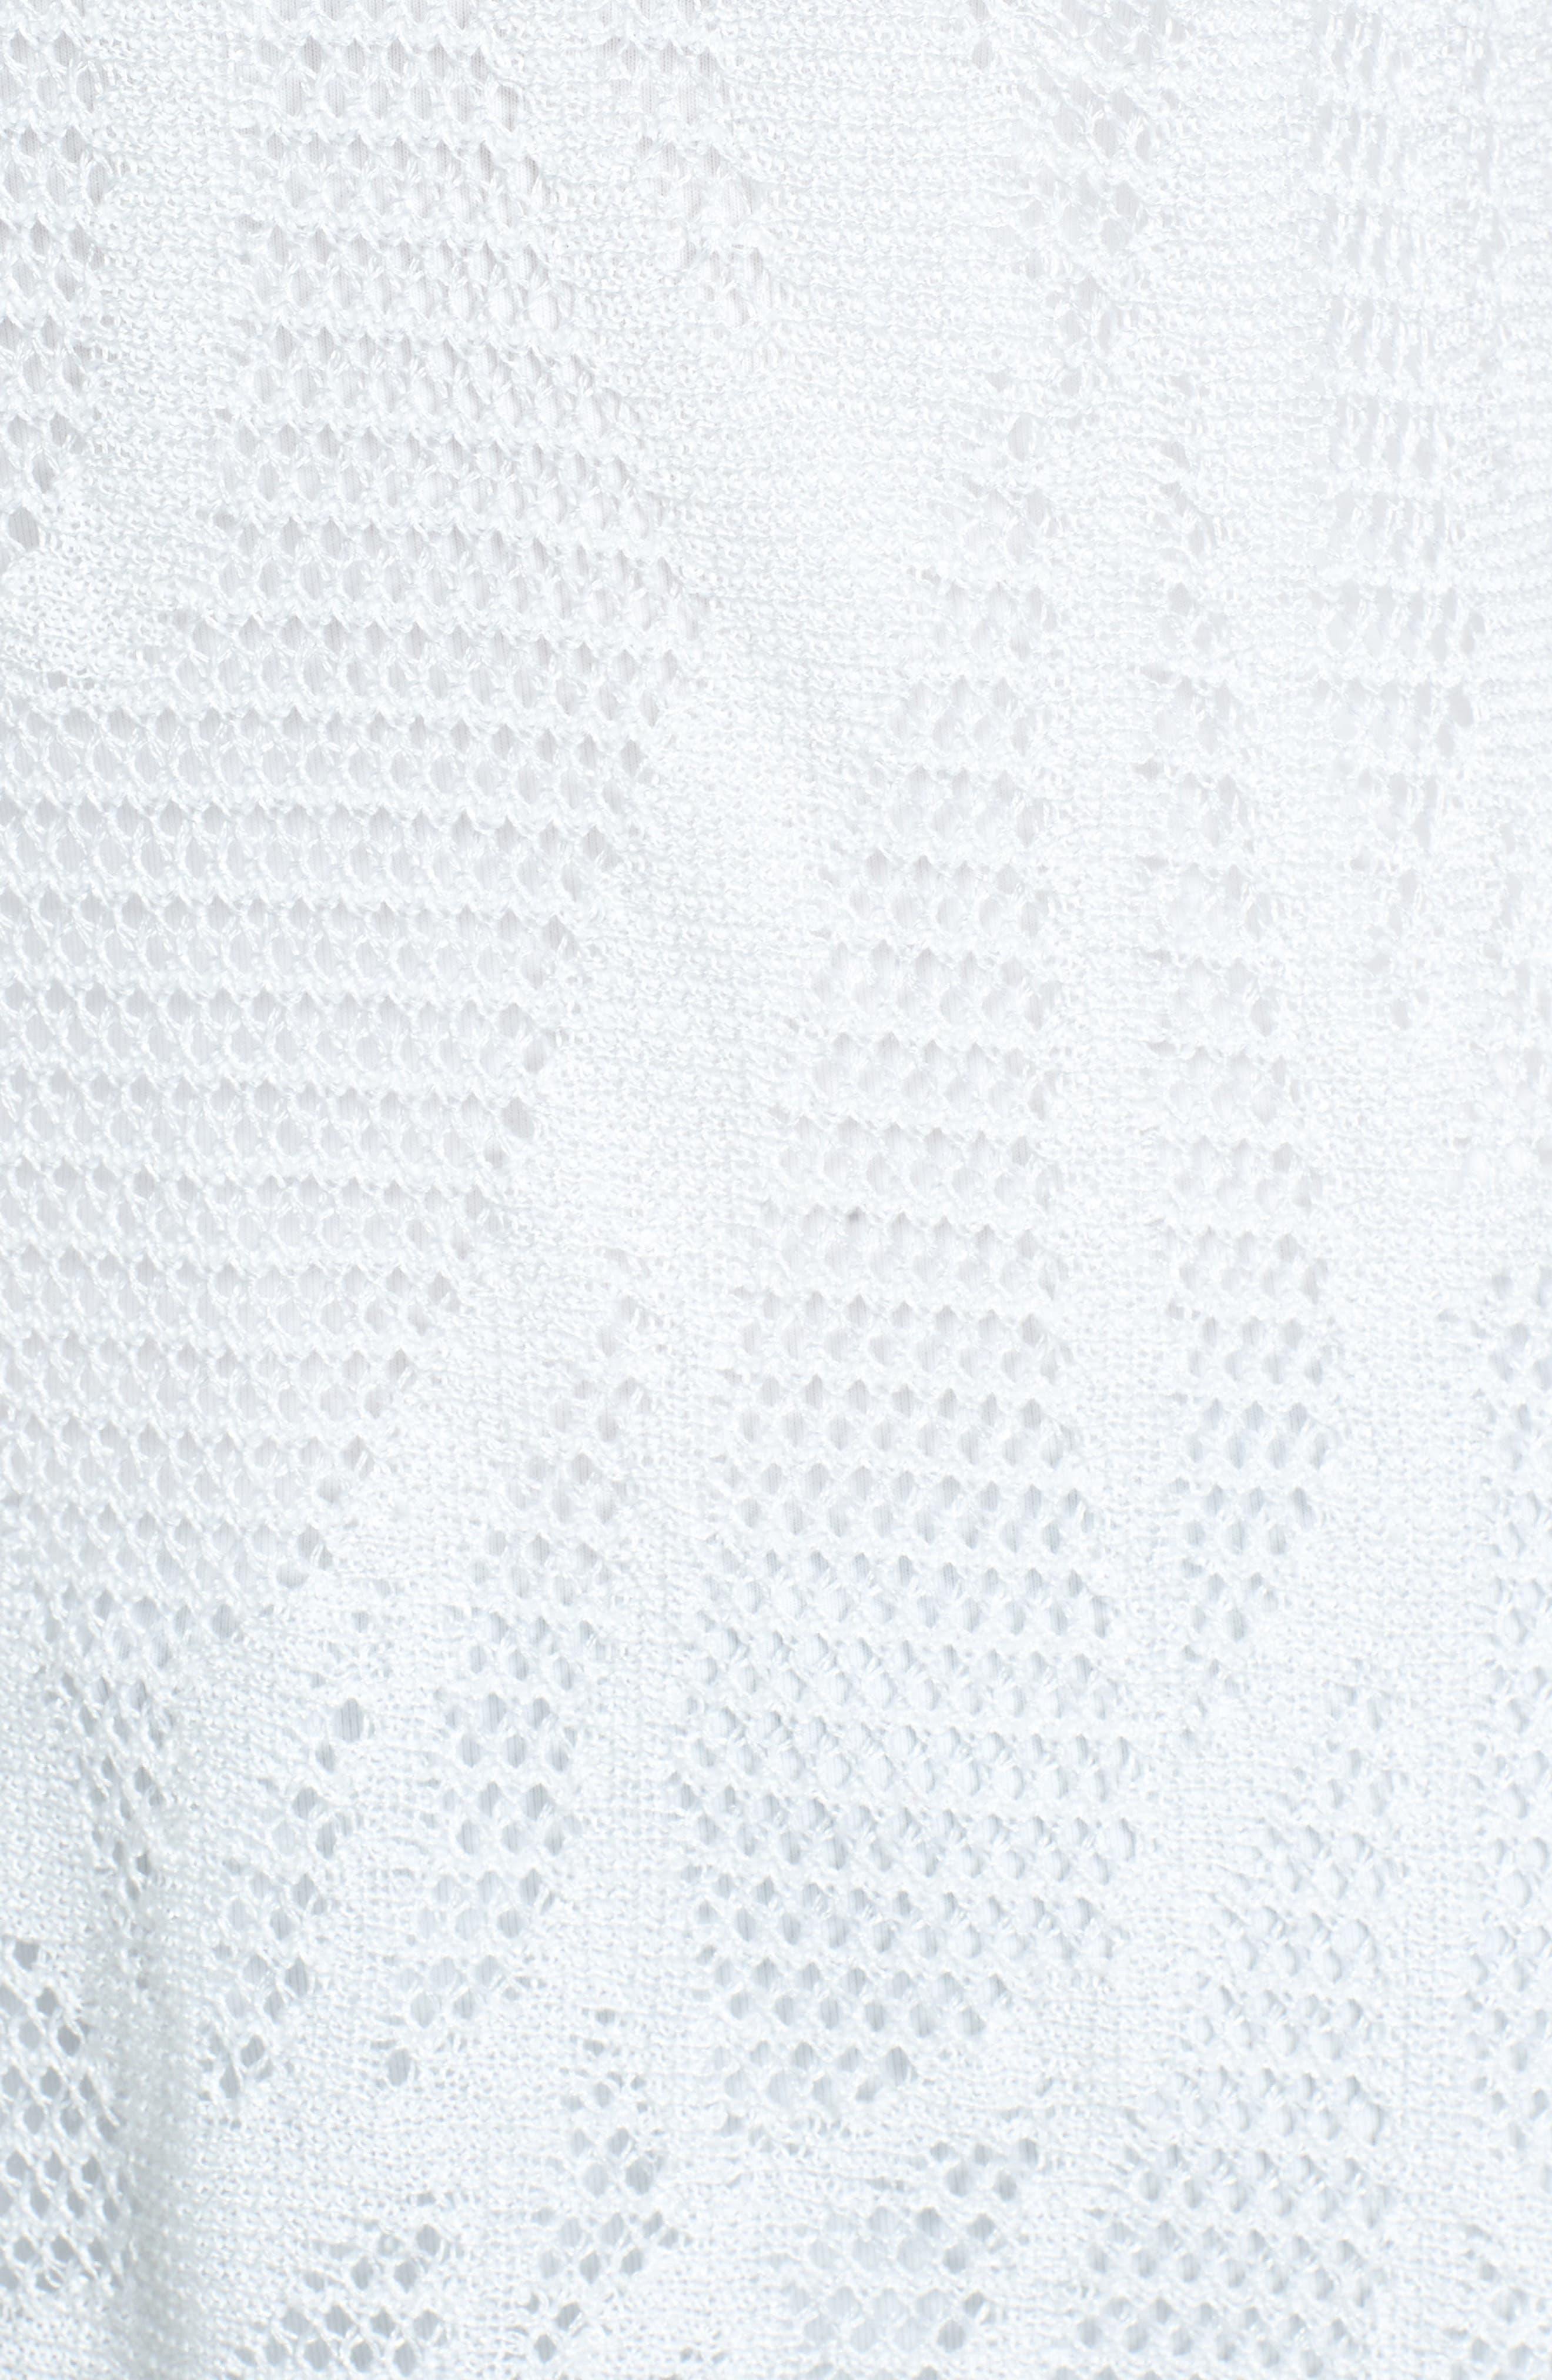 Desert Wind Knit Top,                             Alternate thumbnail 5, color,                             123